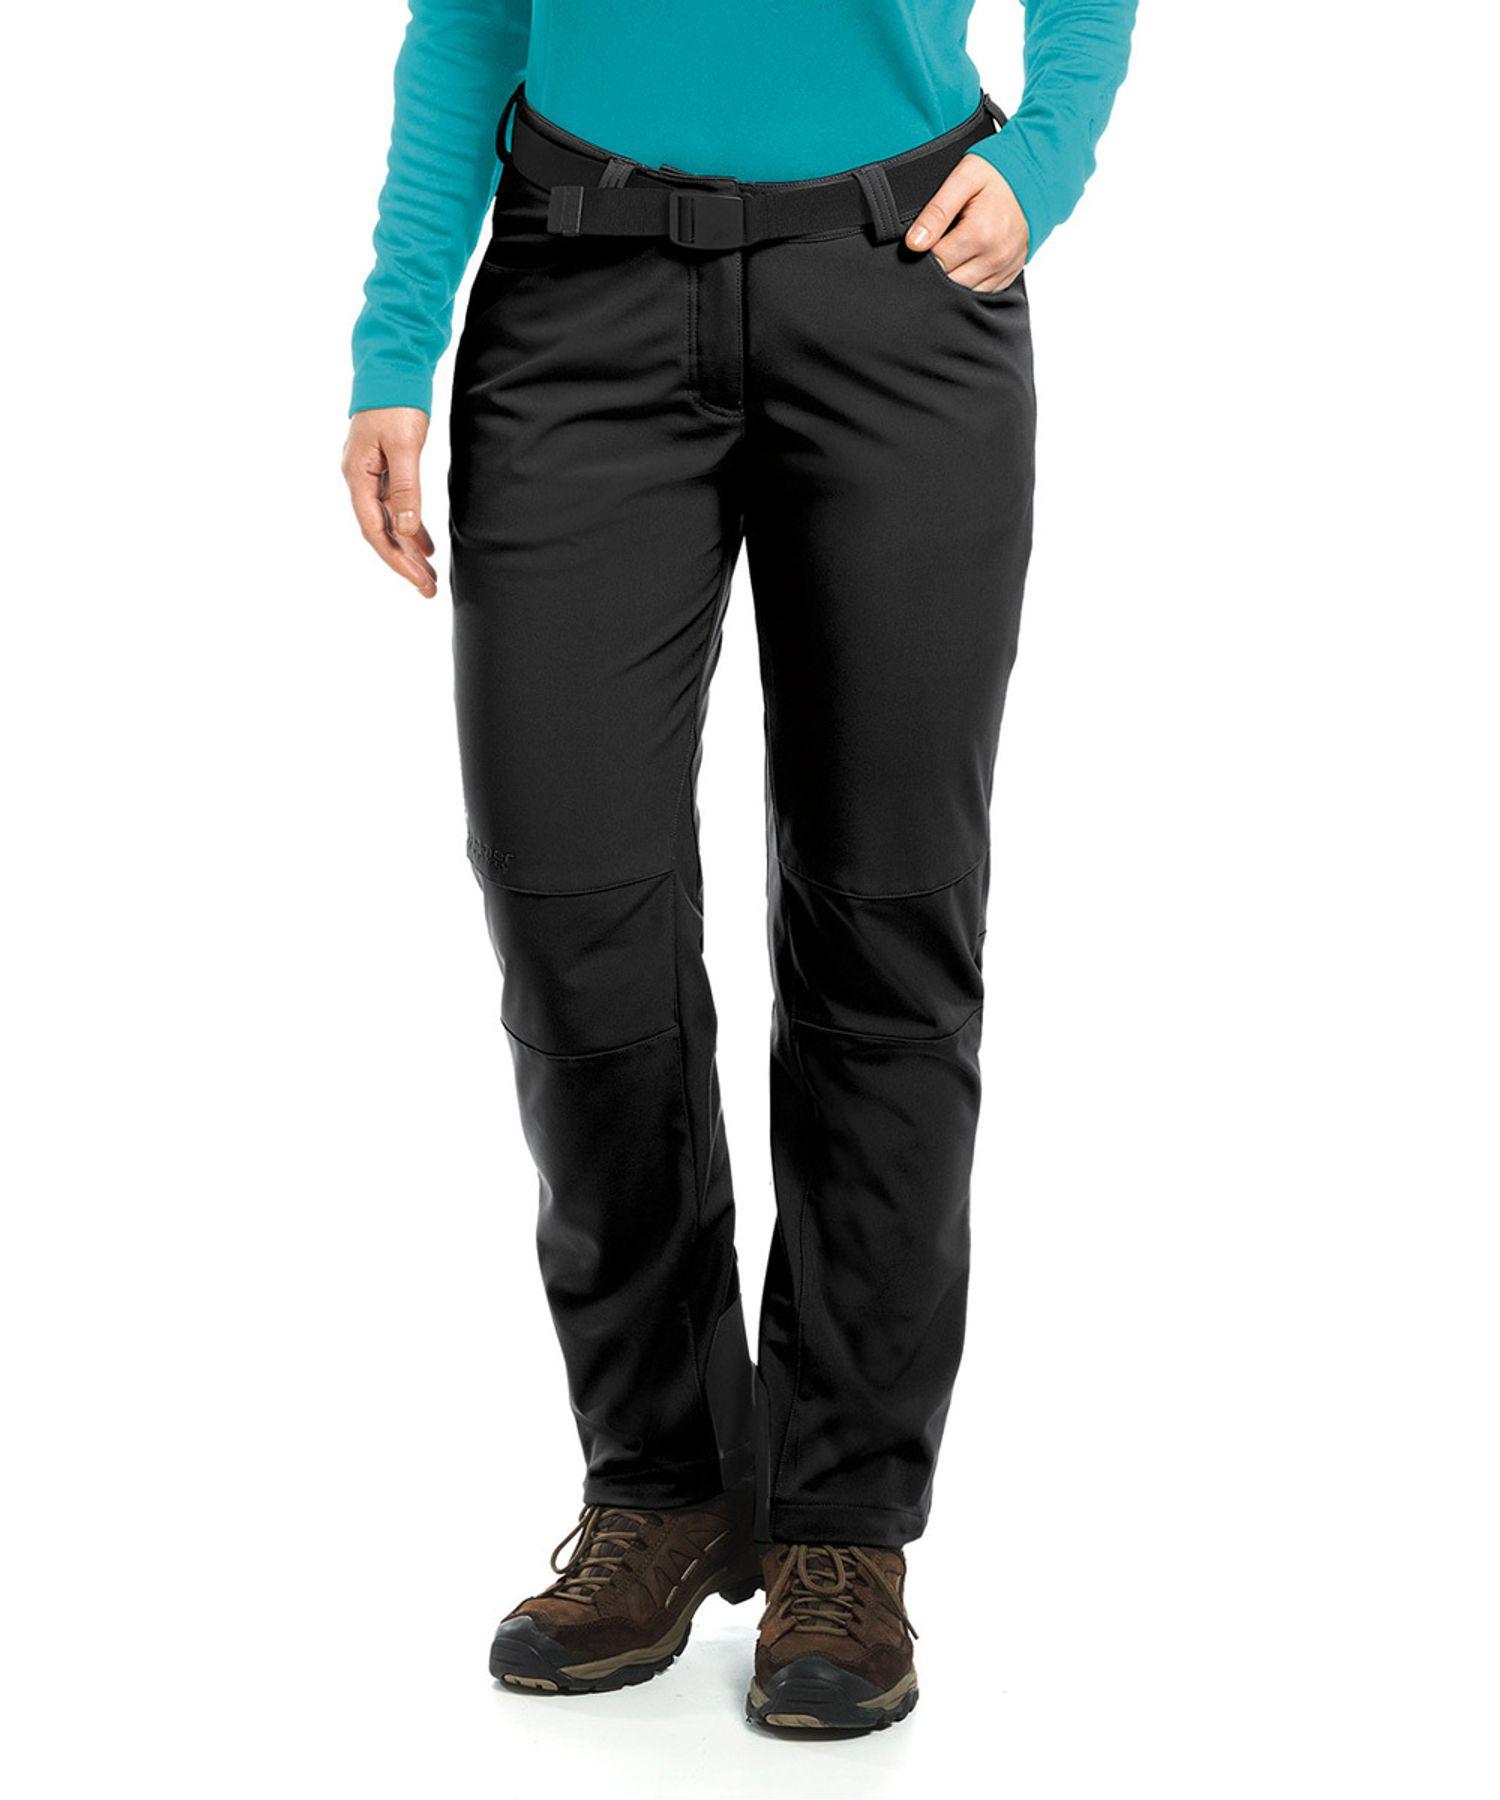 Maier Sports- Damen Funktionelle Softshell Touren - und Wanderhose in Black Artikel Tech Pants W (236008) – Bild 1